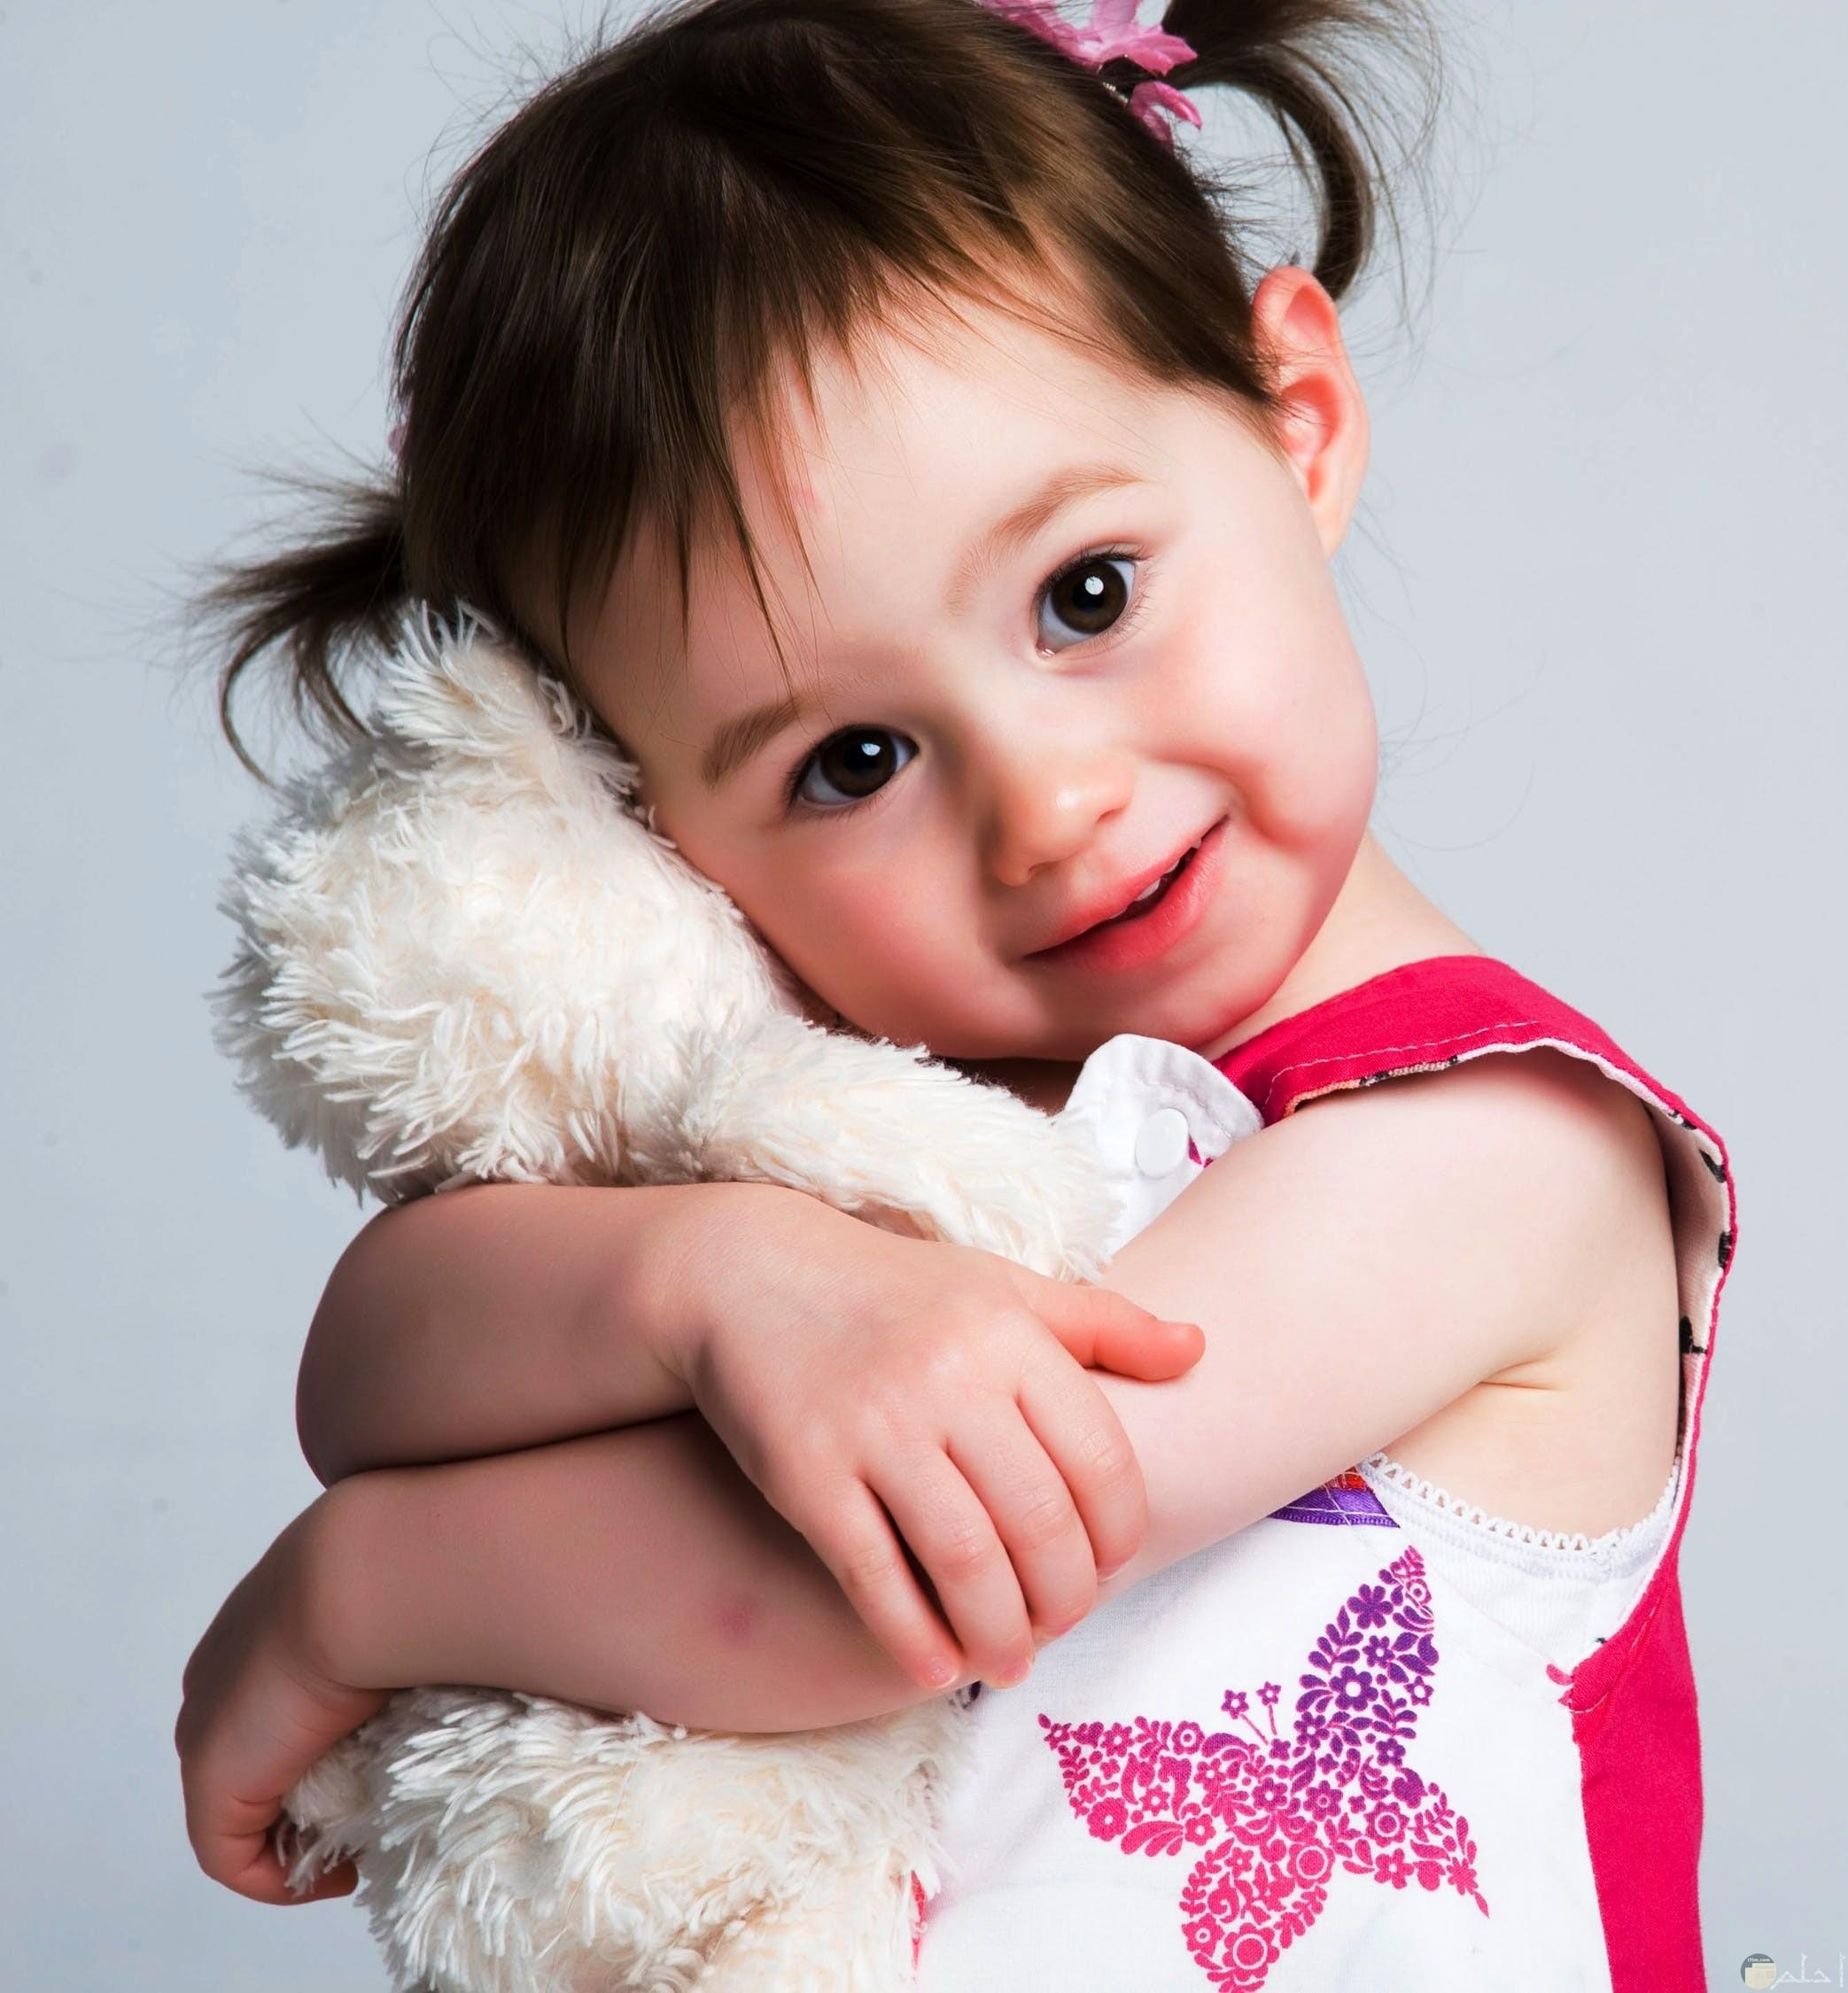 صور اطفال صور بيبي صور اولاد صور حلوين اطفال حلوينصور اطفال صغار2020 3